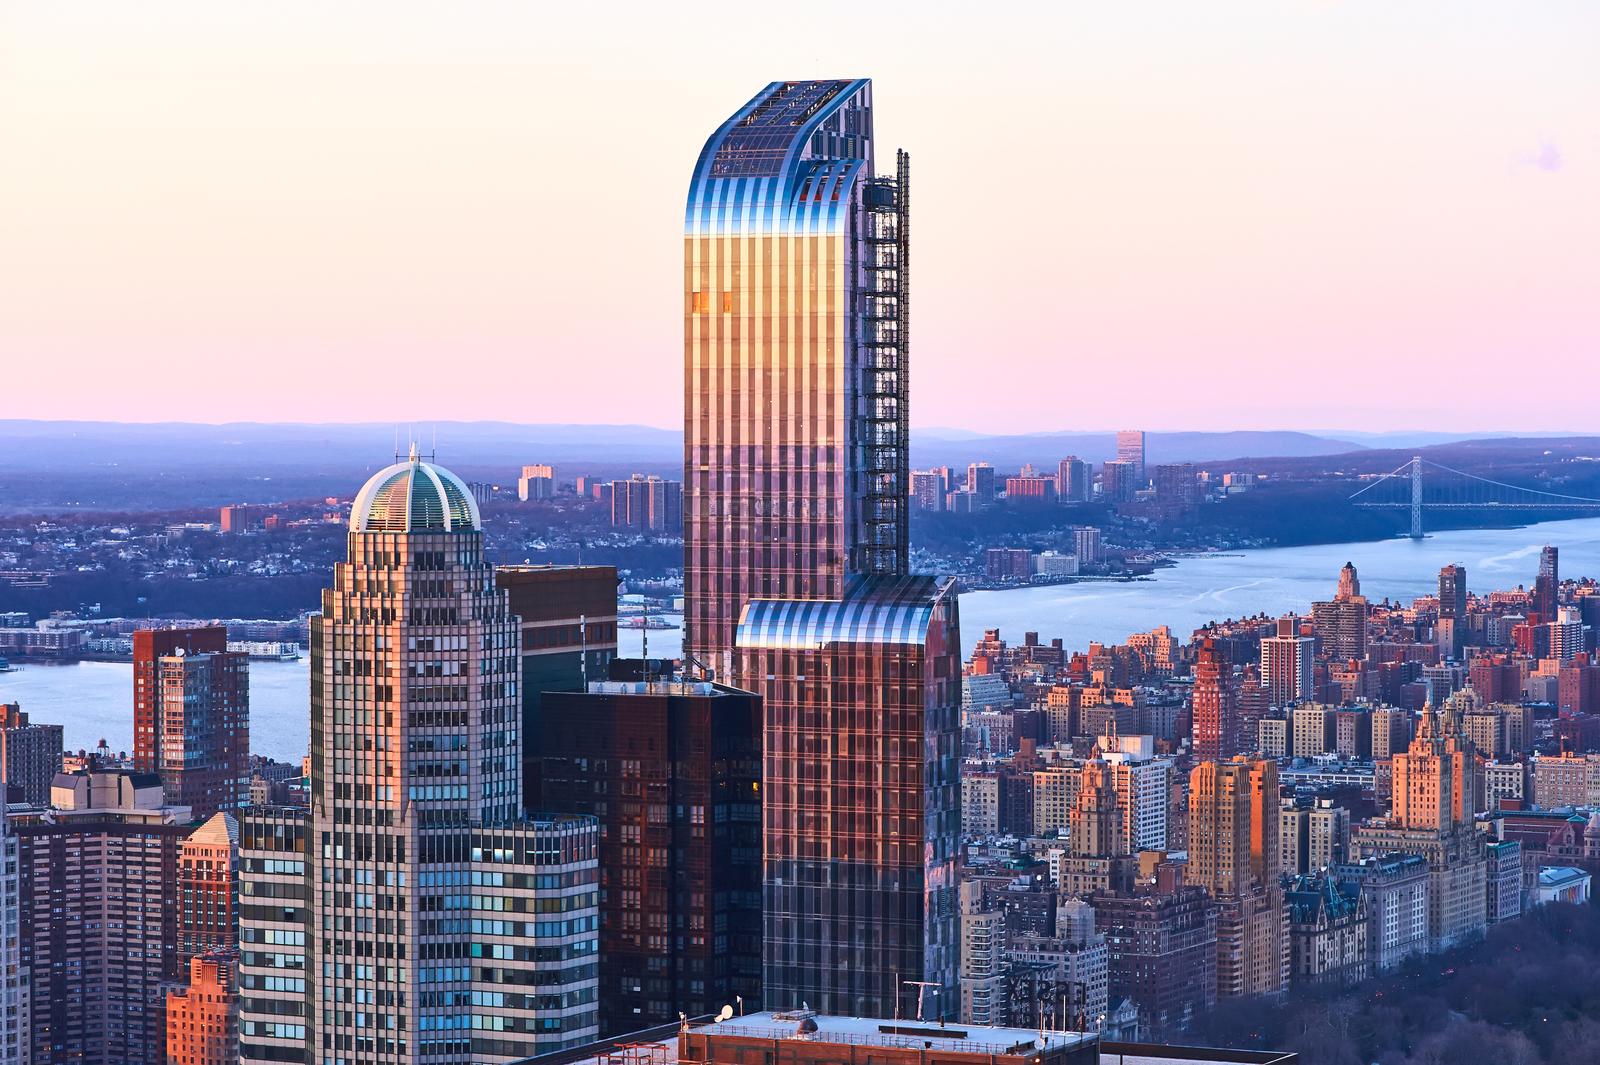 Little Germany Manhattan, NY Private Investigator